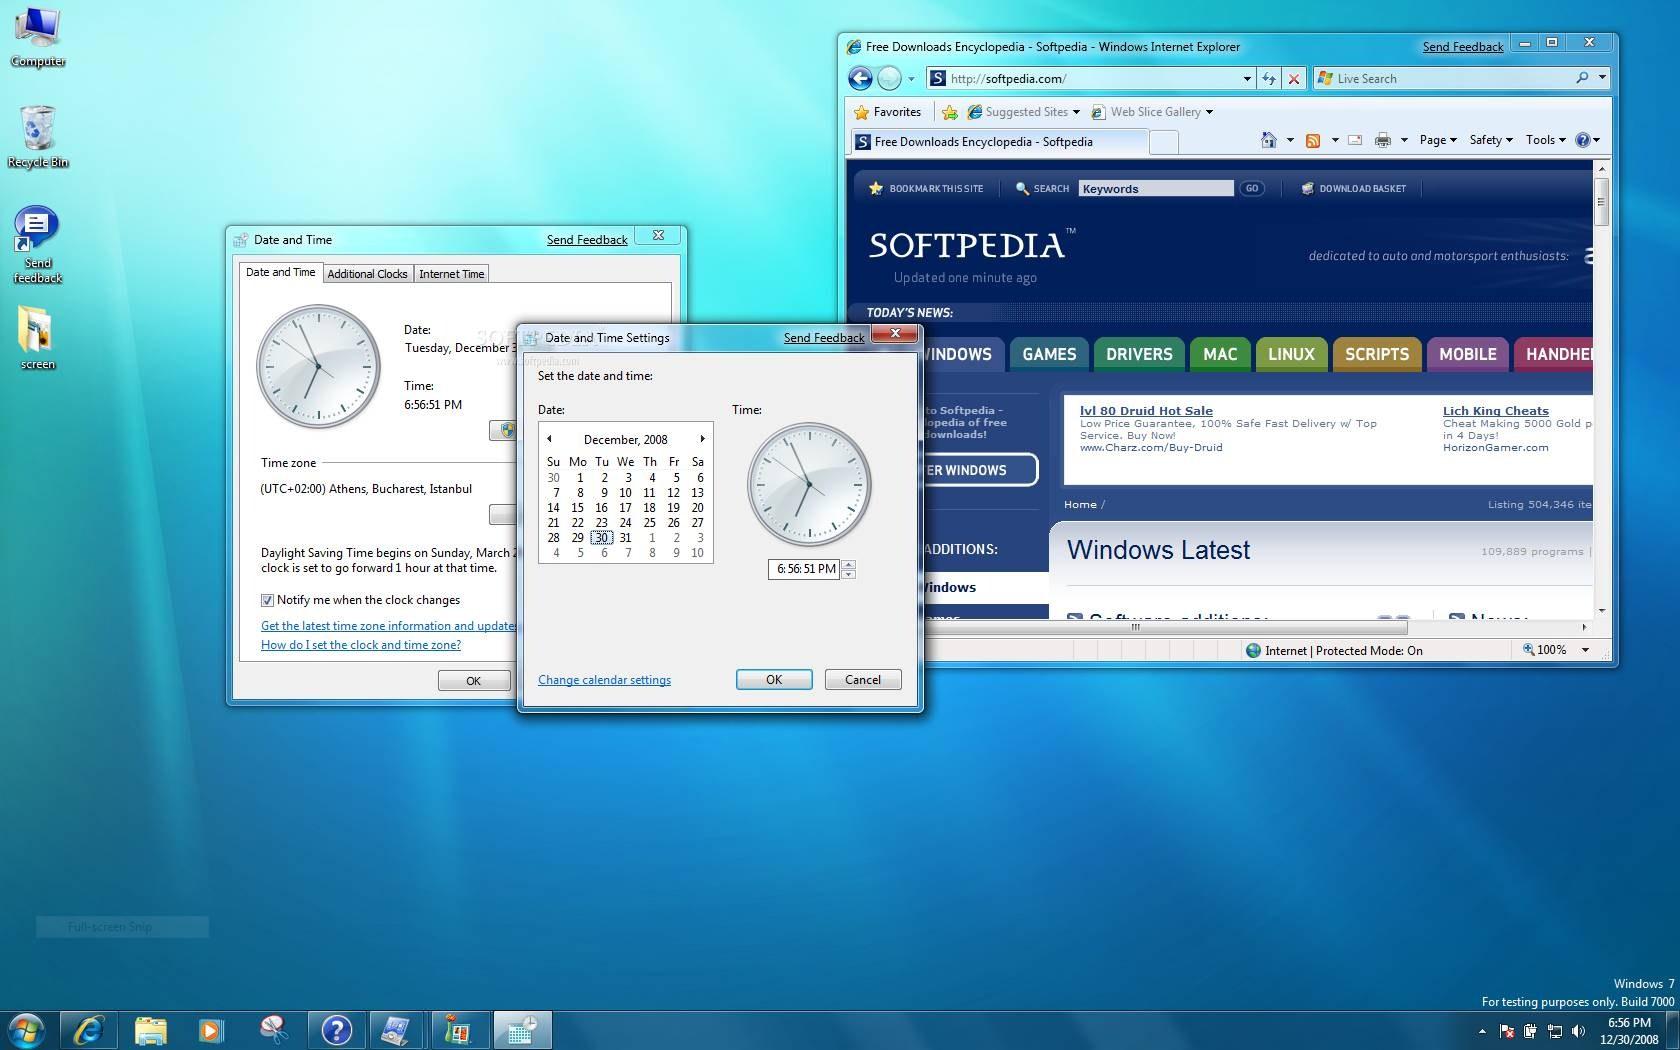 windows 7 service pack 1 (sp1) 32-bit